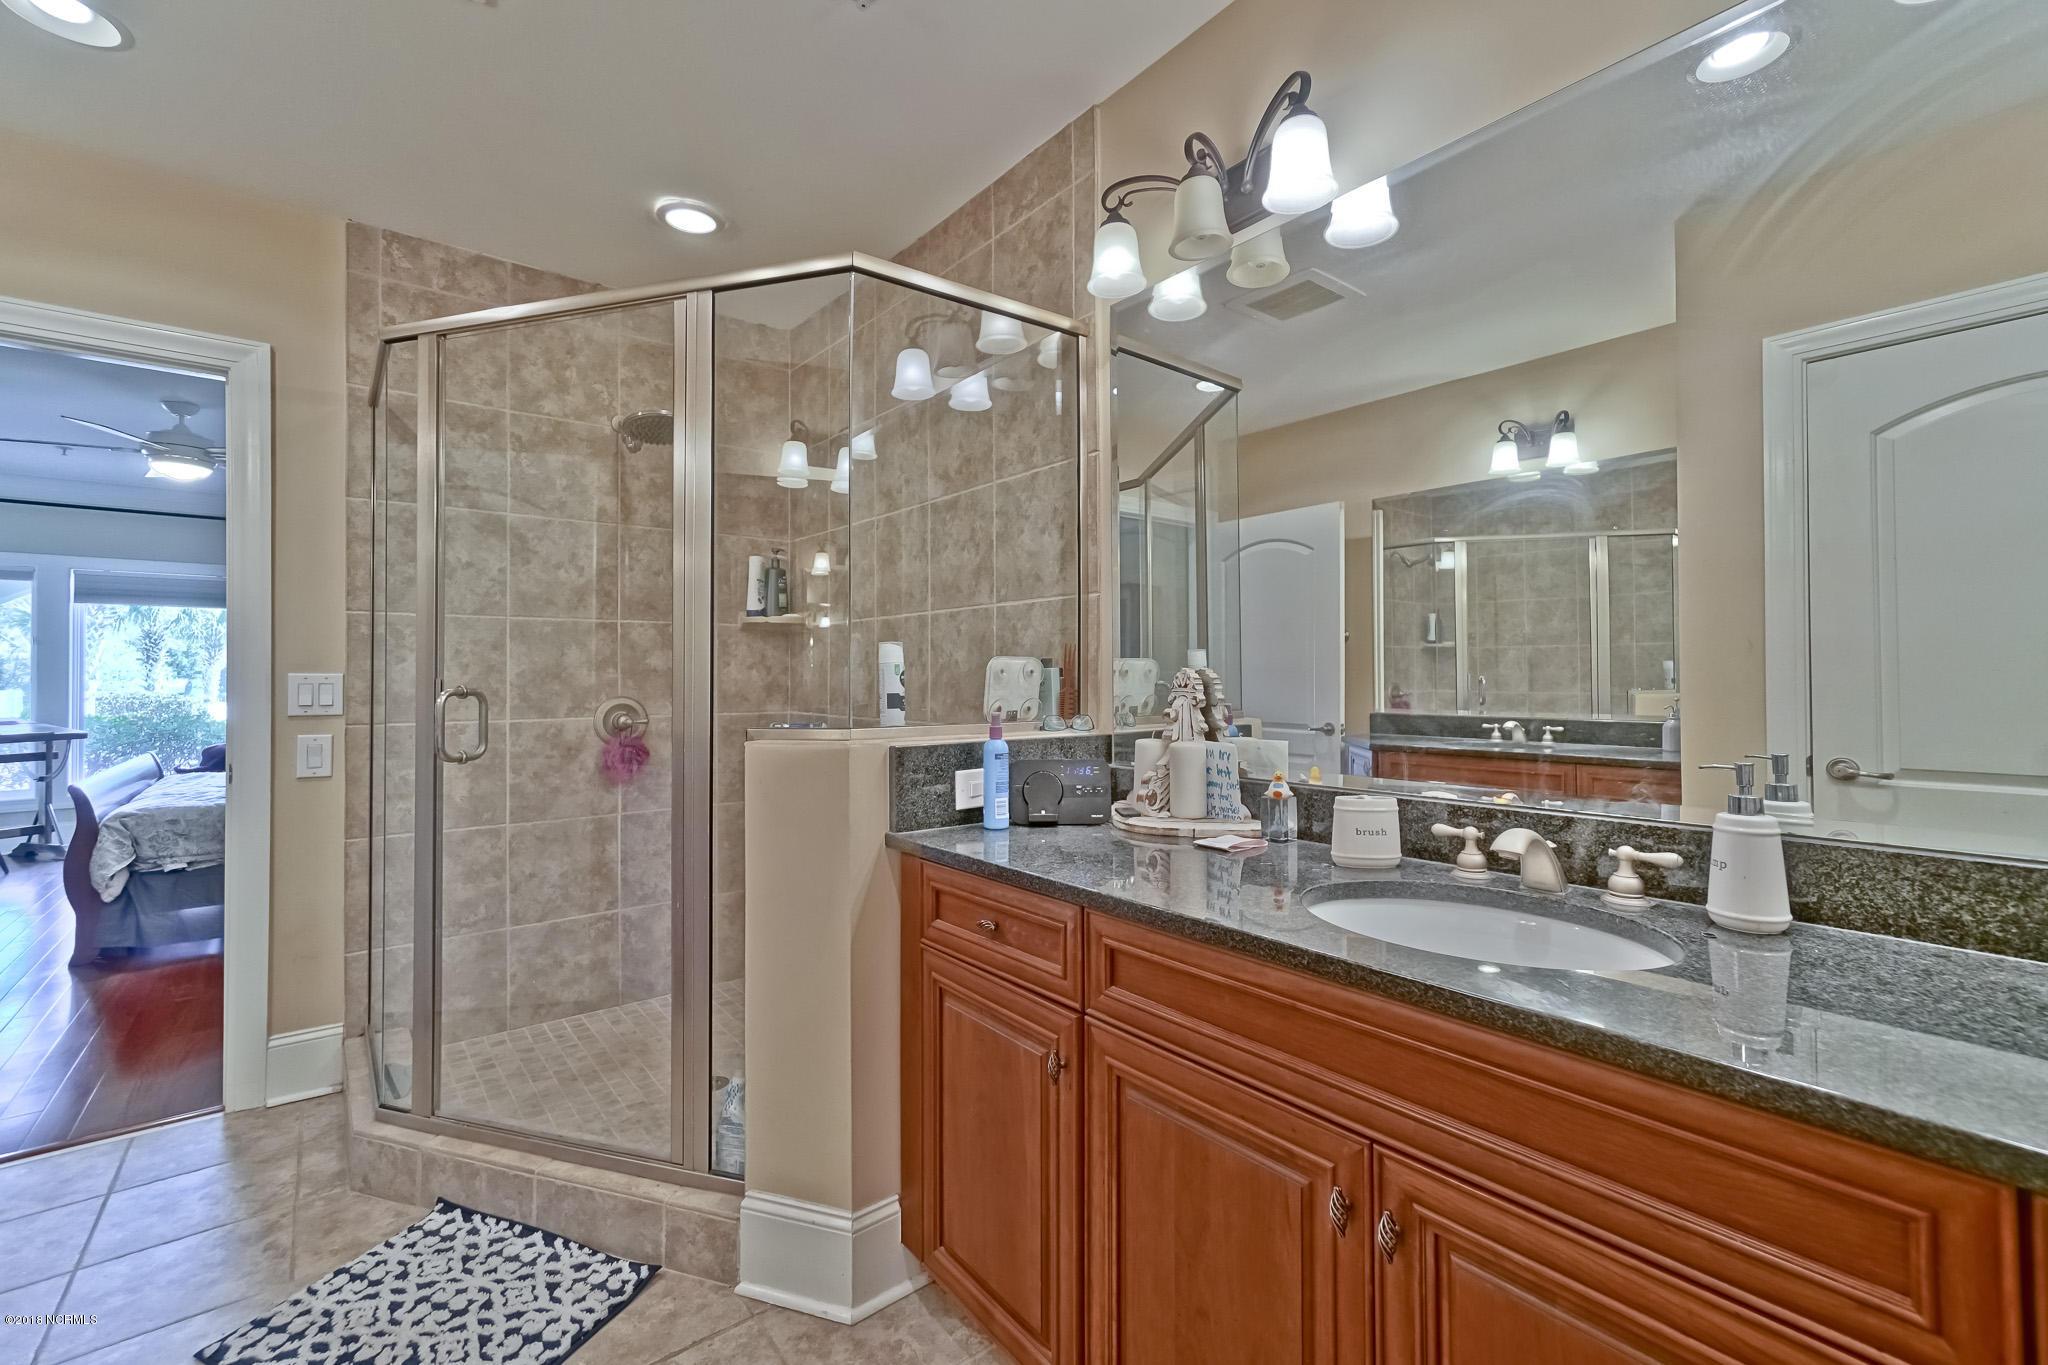 915 Shoreline Drive, Sunset Beach, North Carolina 28468, 3 Bedrooms Bedrooms, 6 Rooms Rooms,3 BathroomsBathrooms,Condominium,For sale,Shoreline,100111615